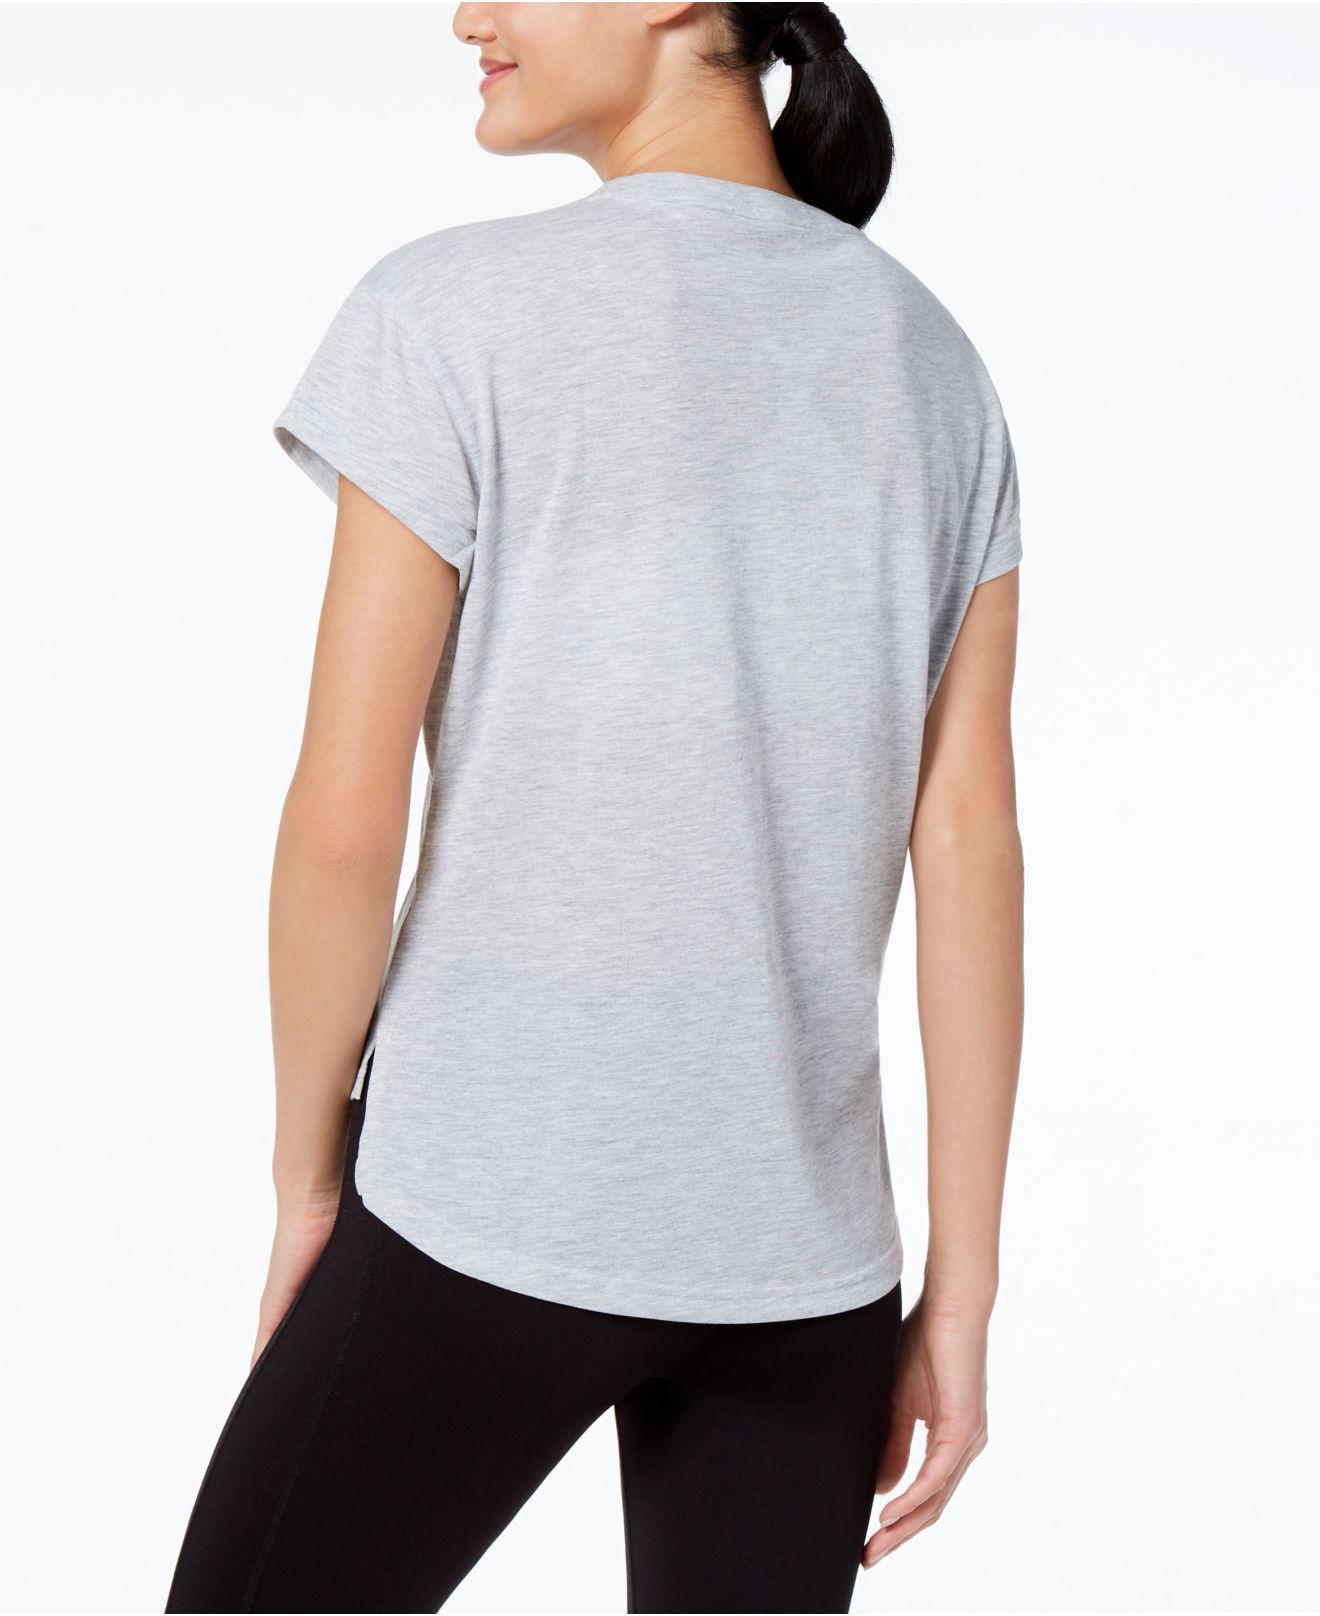 8e08a4b458cb Lyst - Puma Urban Sport Metallic-logo T-shirt in Gray